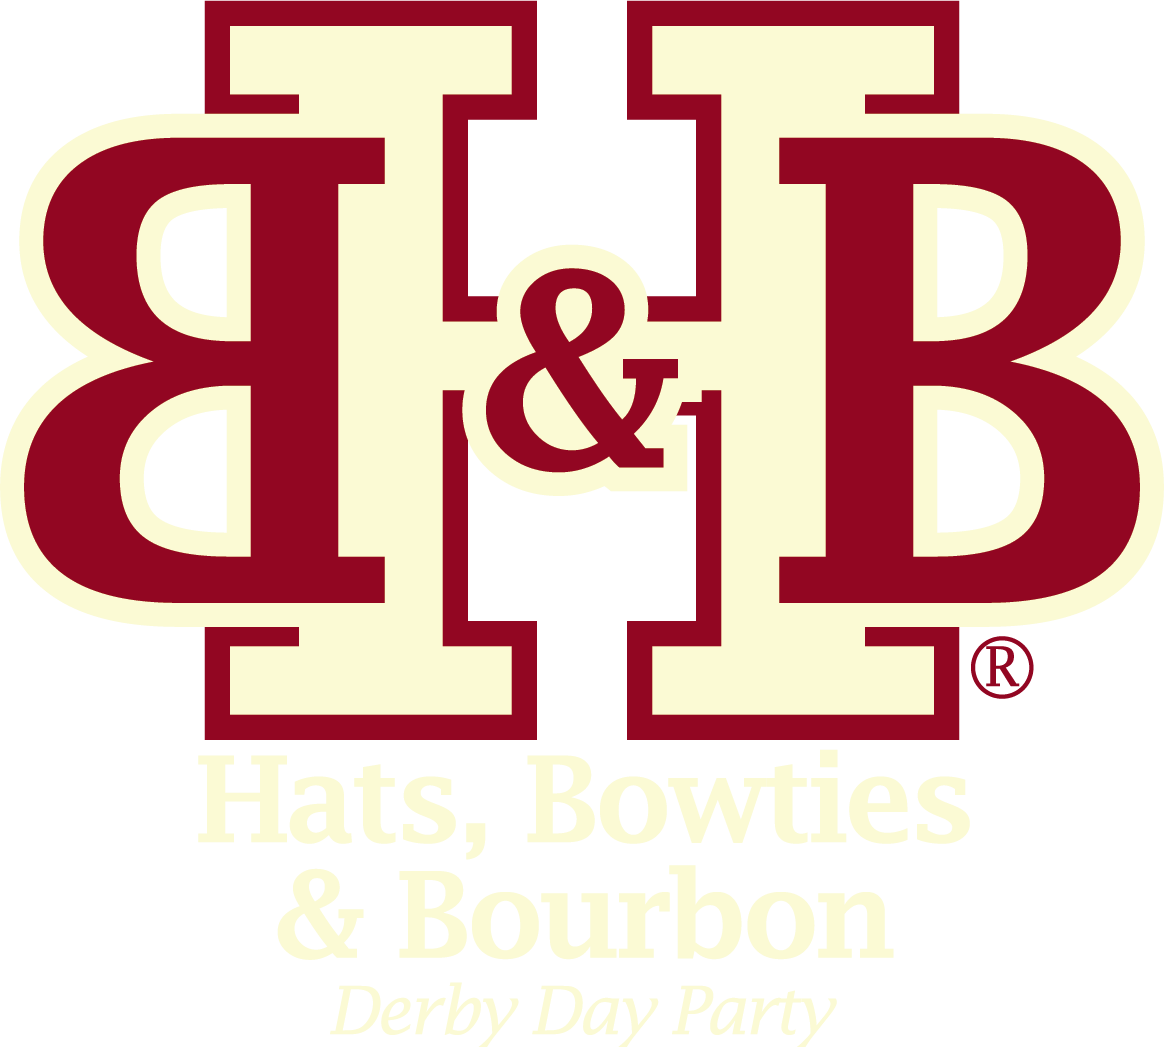 #hatsbowtiesbourbon